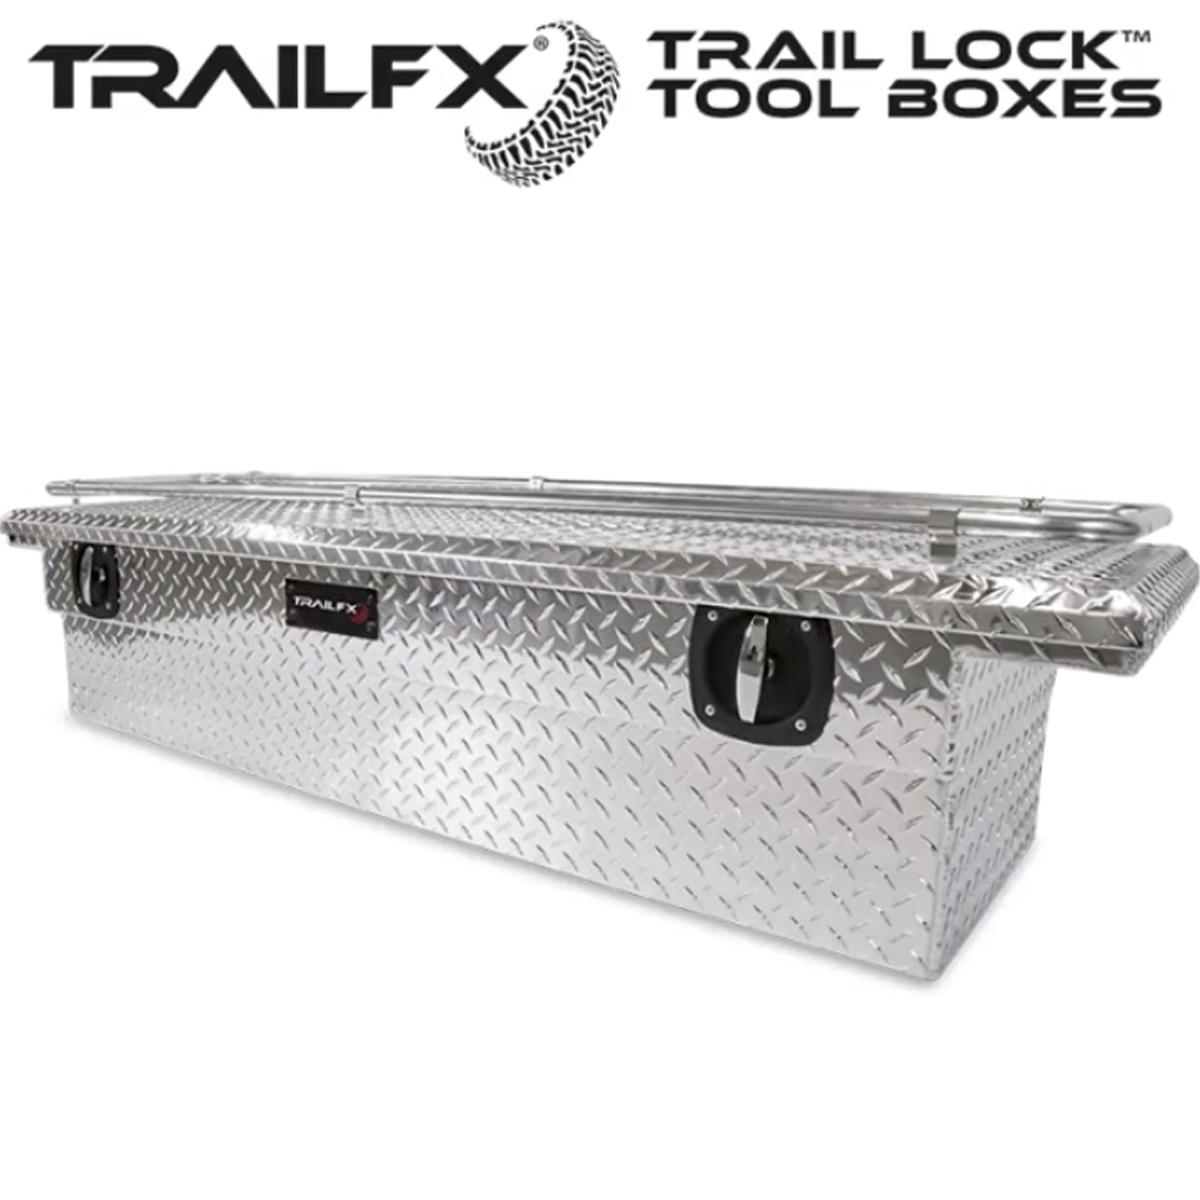 TrailFX Toolboxes